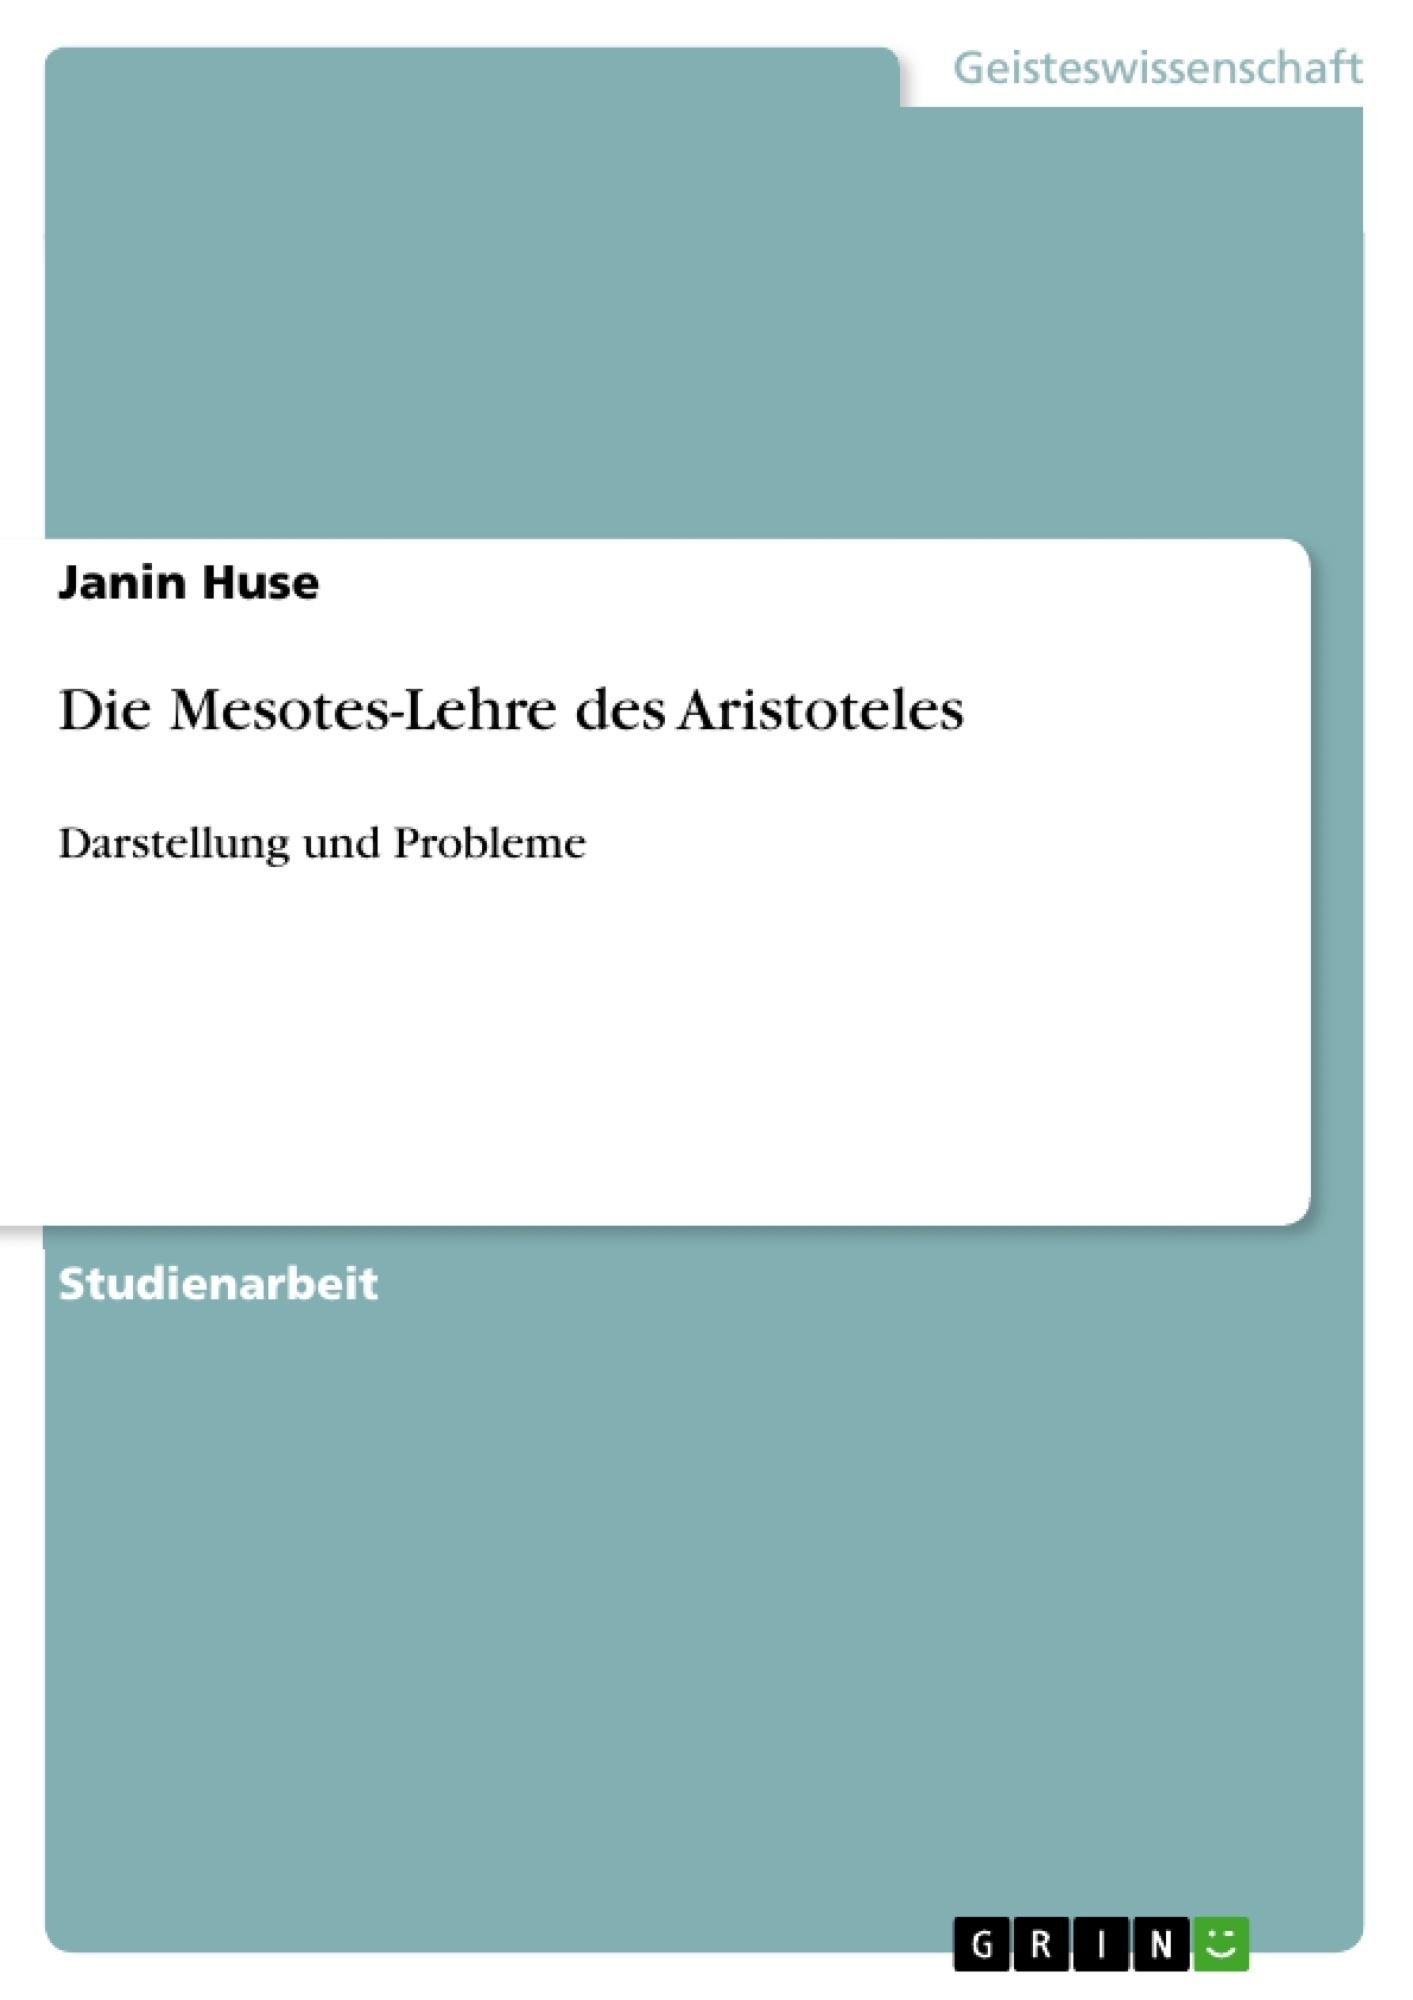 Titel: Die Mesotes-Lehre des Aristoteles